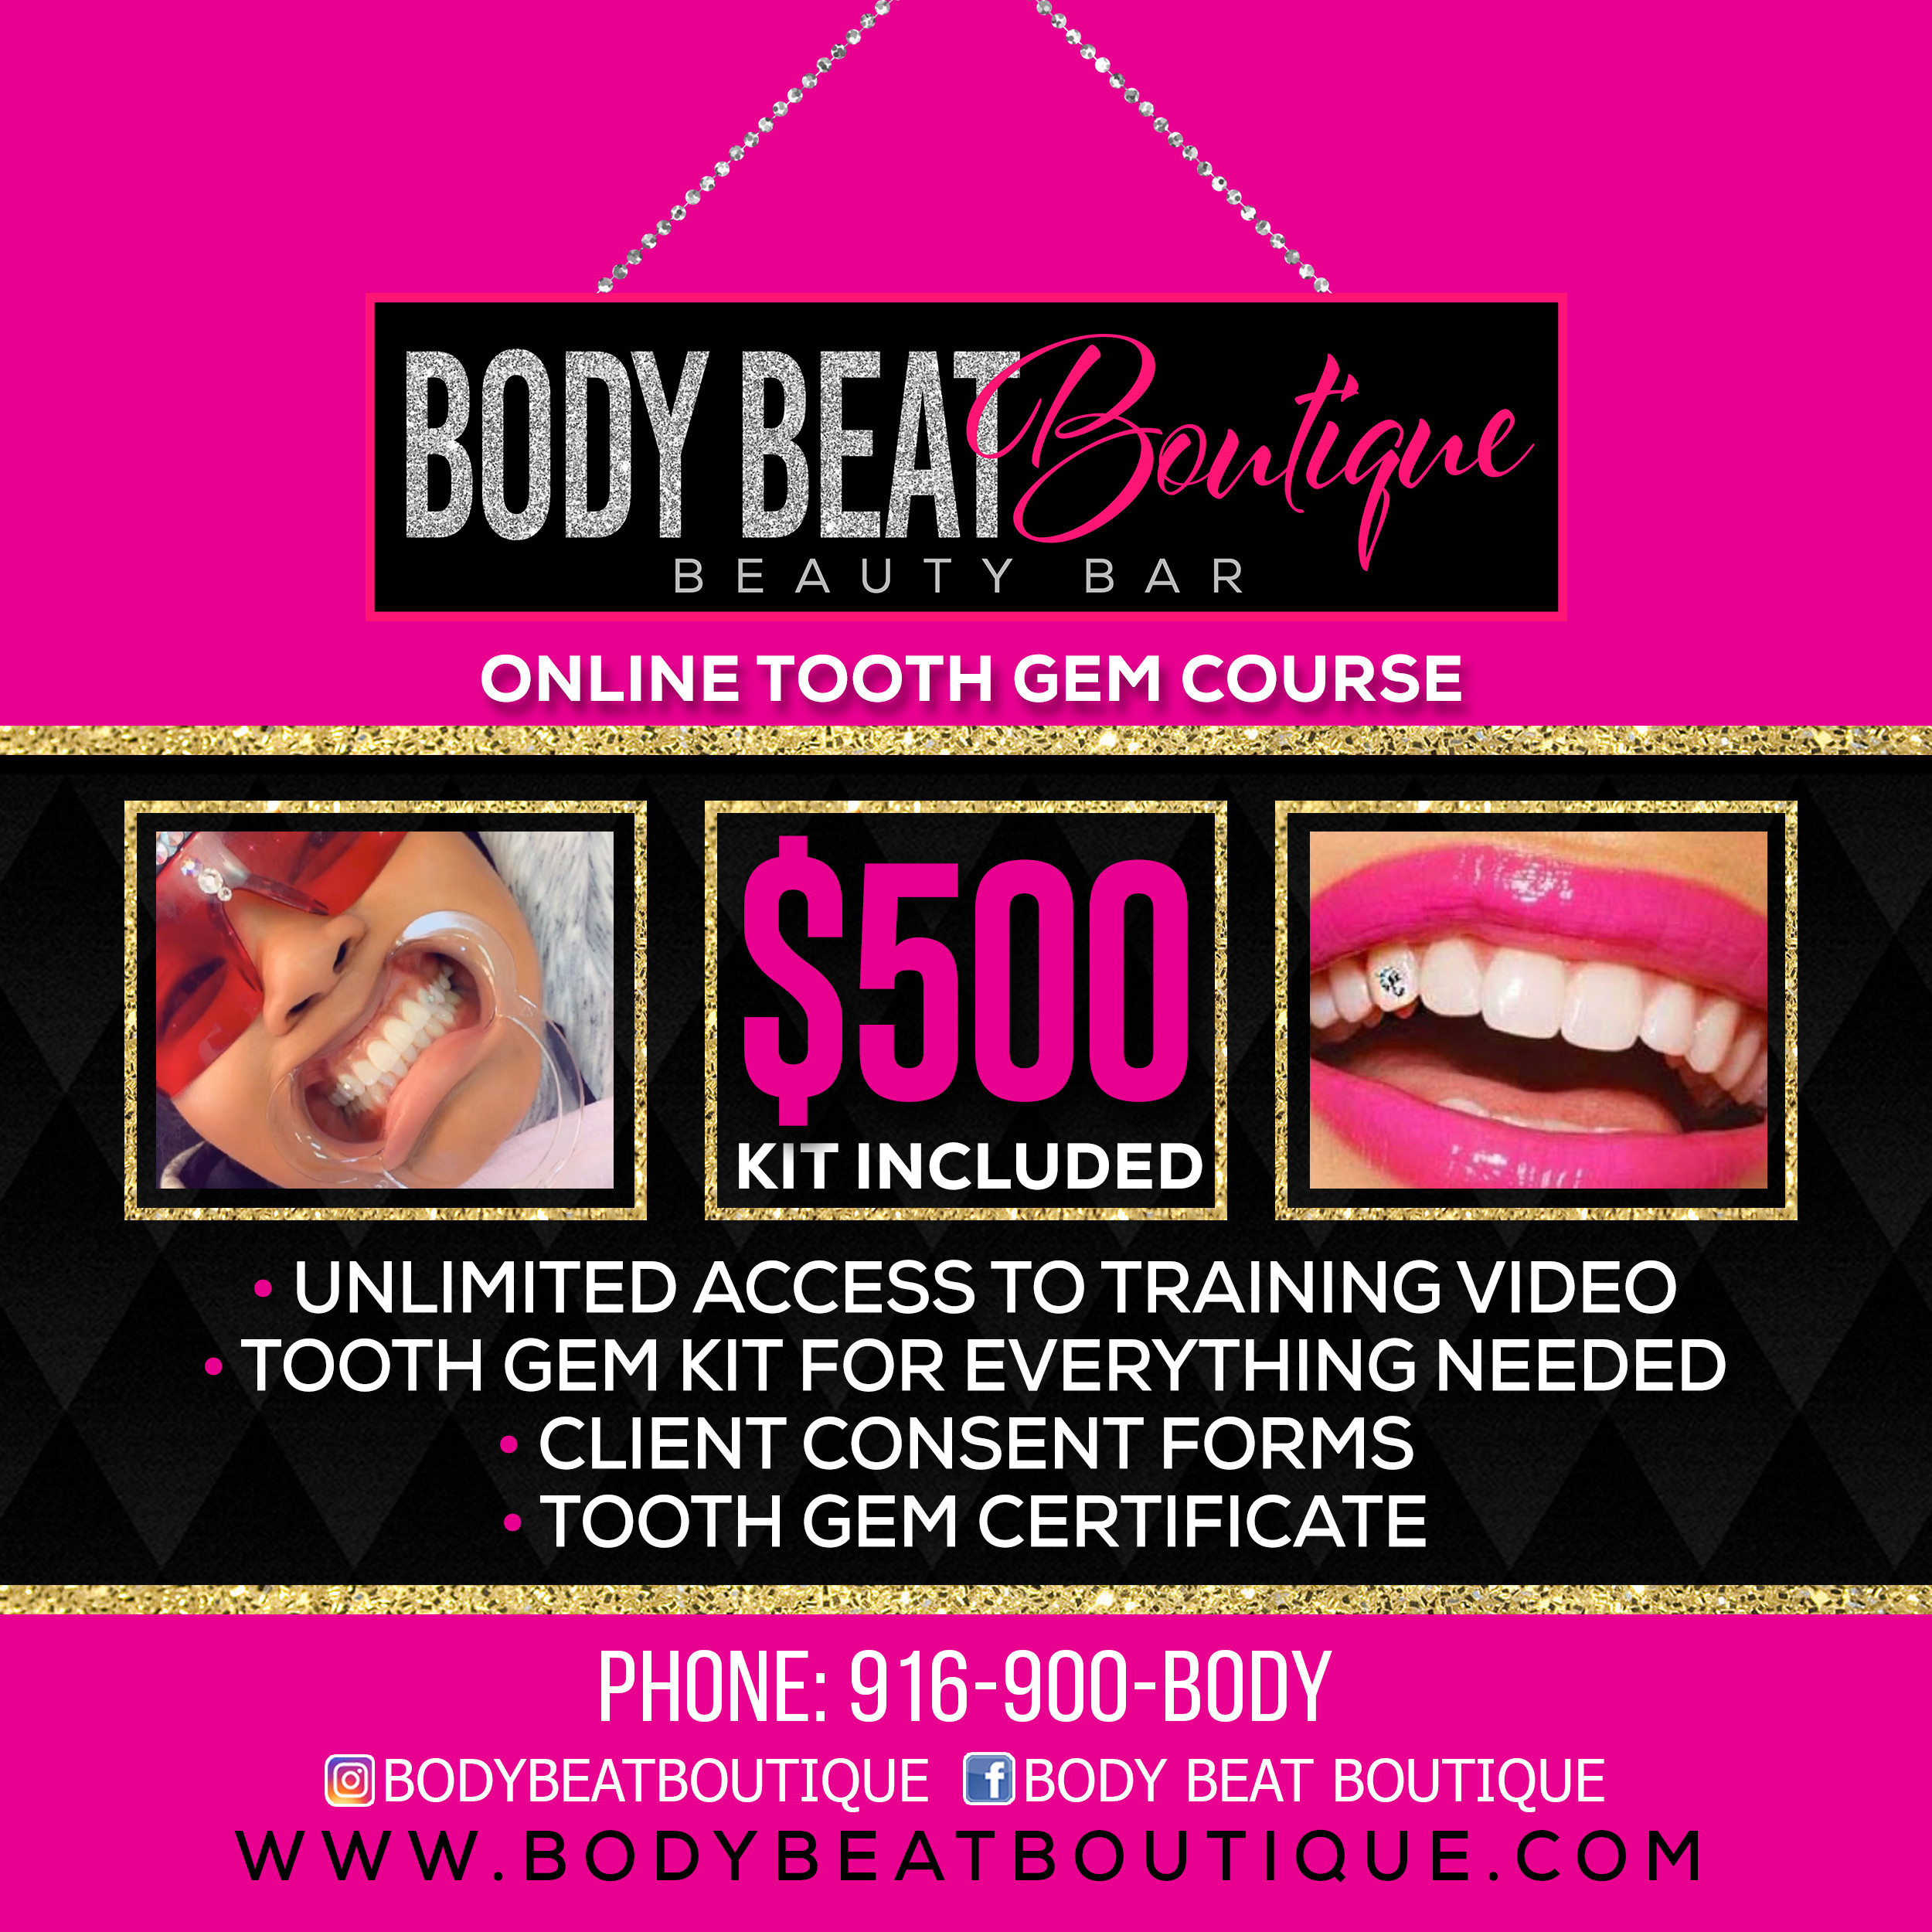 Online Tooth Gem Training